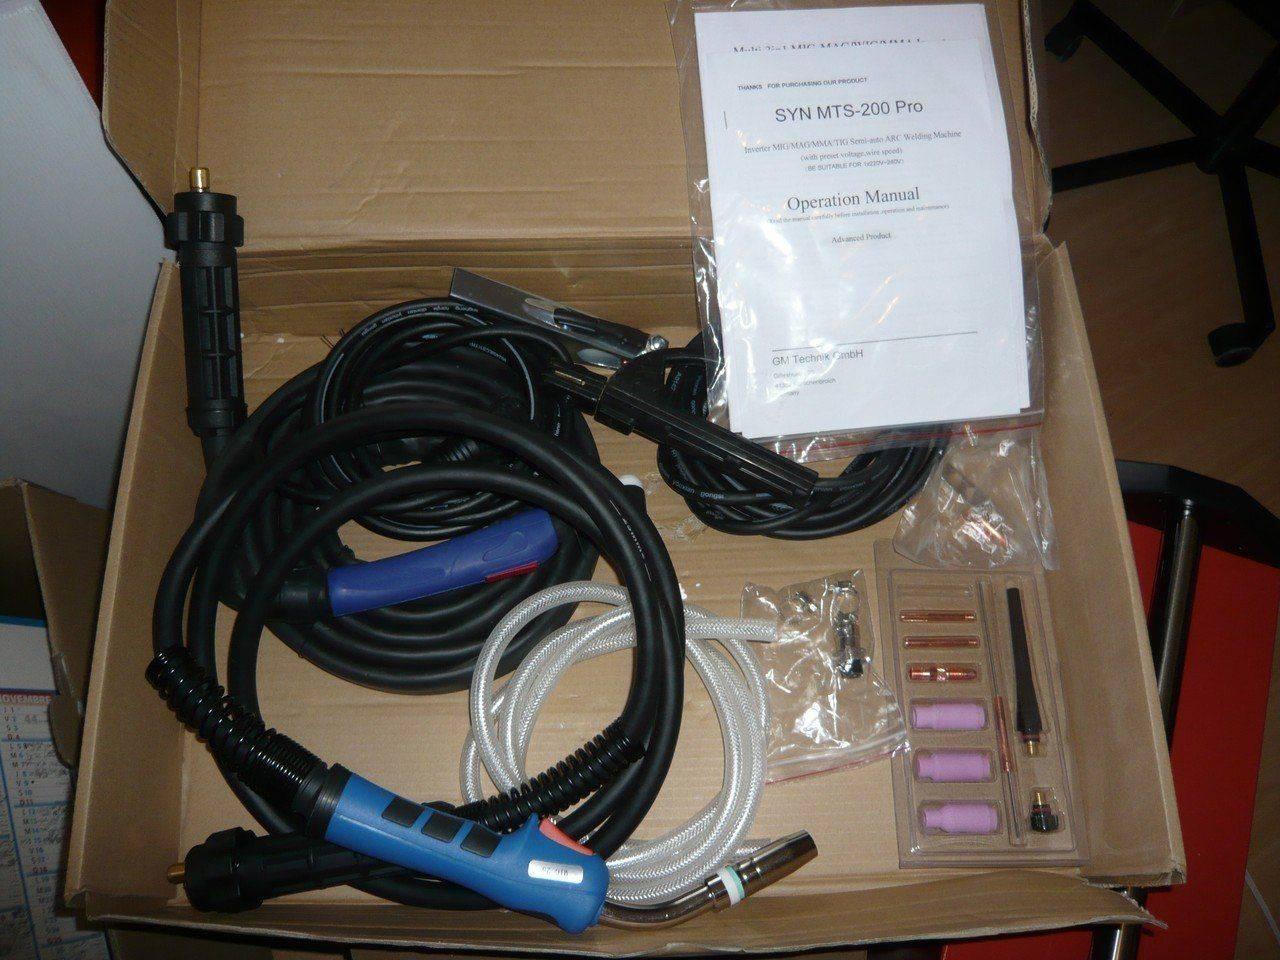 P1100320.JPG